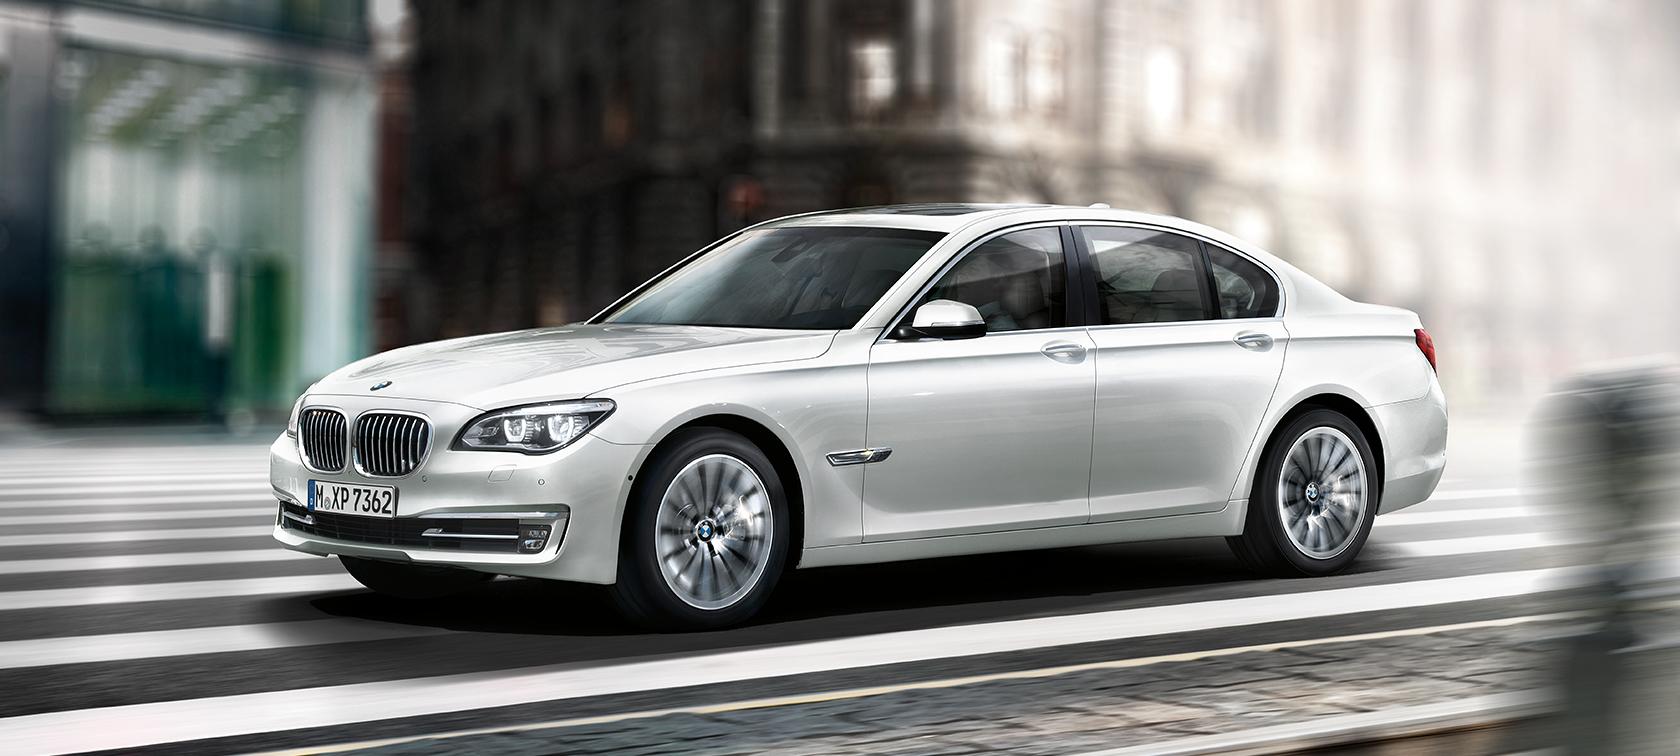 BMW rijders - BMW Navigatie update proces - BMW nl